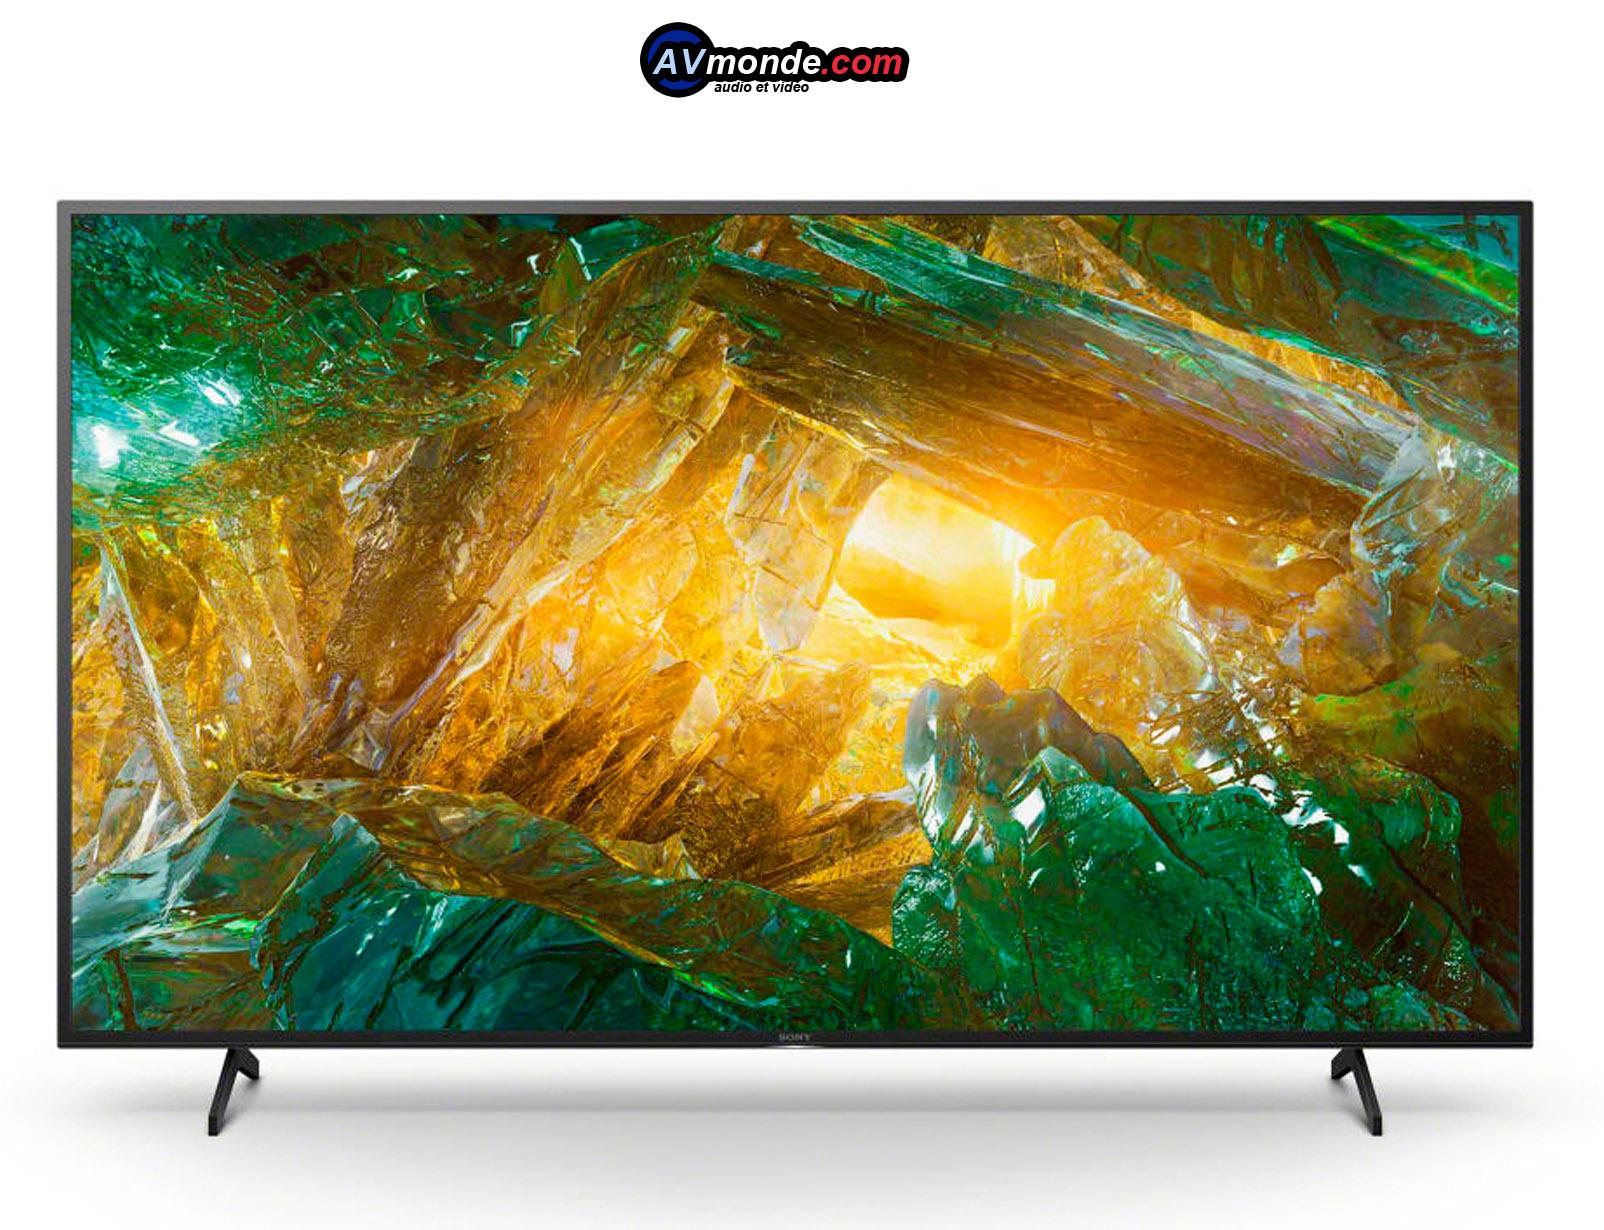 Sony Bravia KD-65XH8096 UHD 4K TV